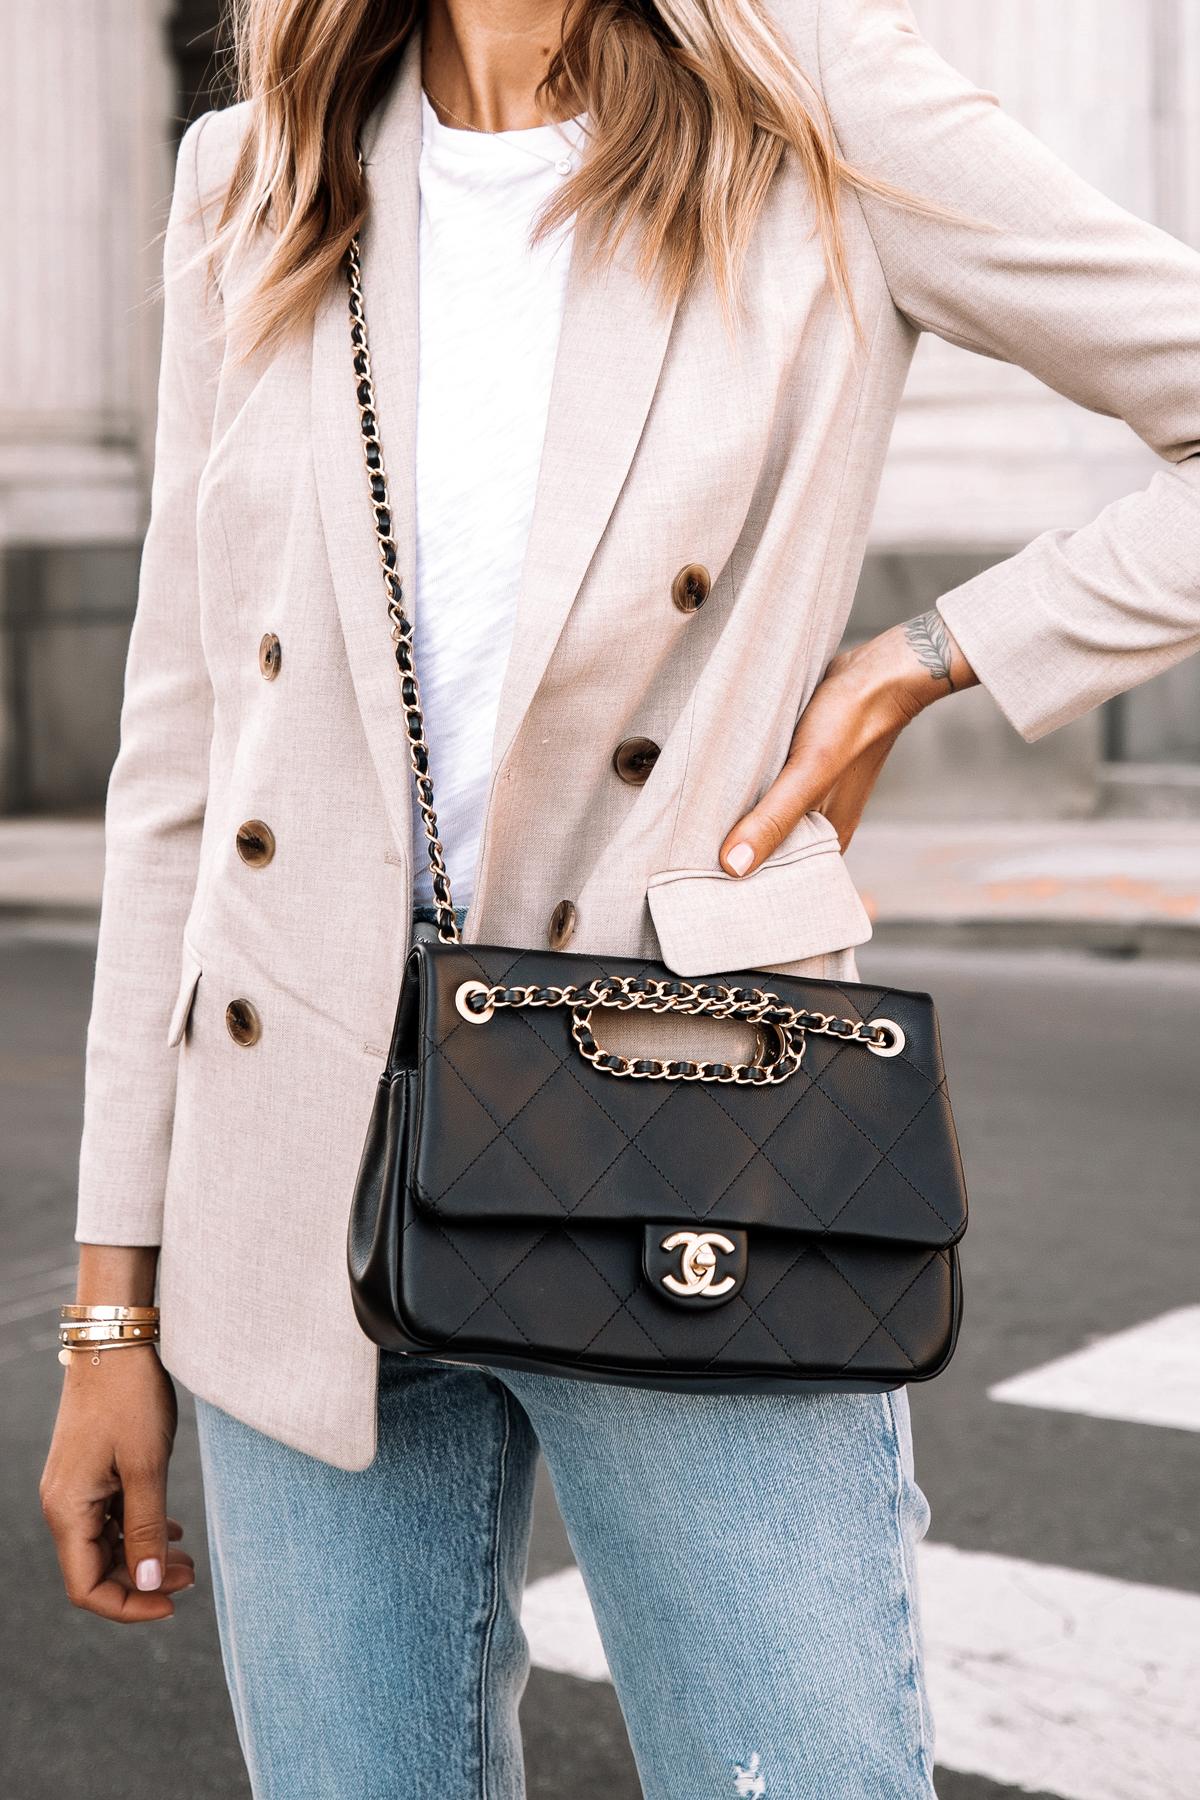 Fashion Jackson Wearing Express Beige Blazer Outfit White Tshirt Jeans Black Chain Chanel Handbag 1